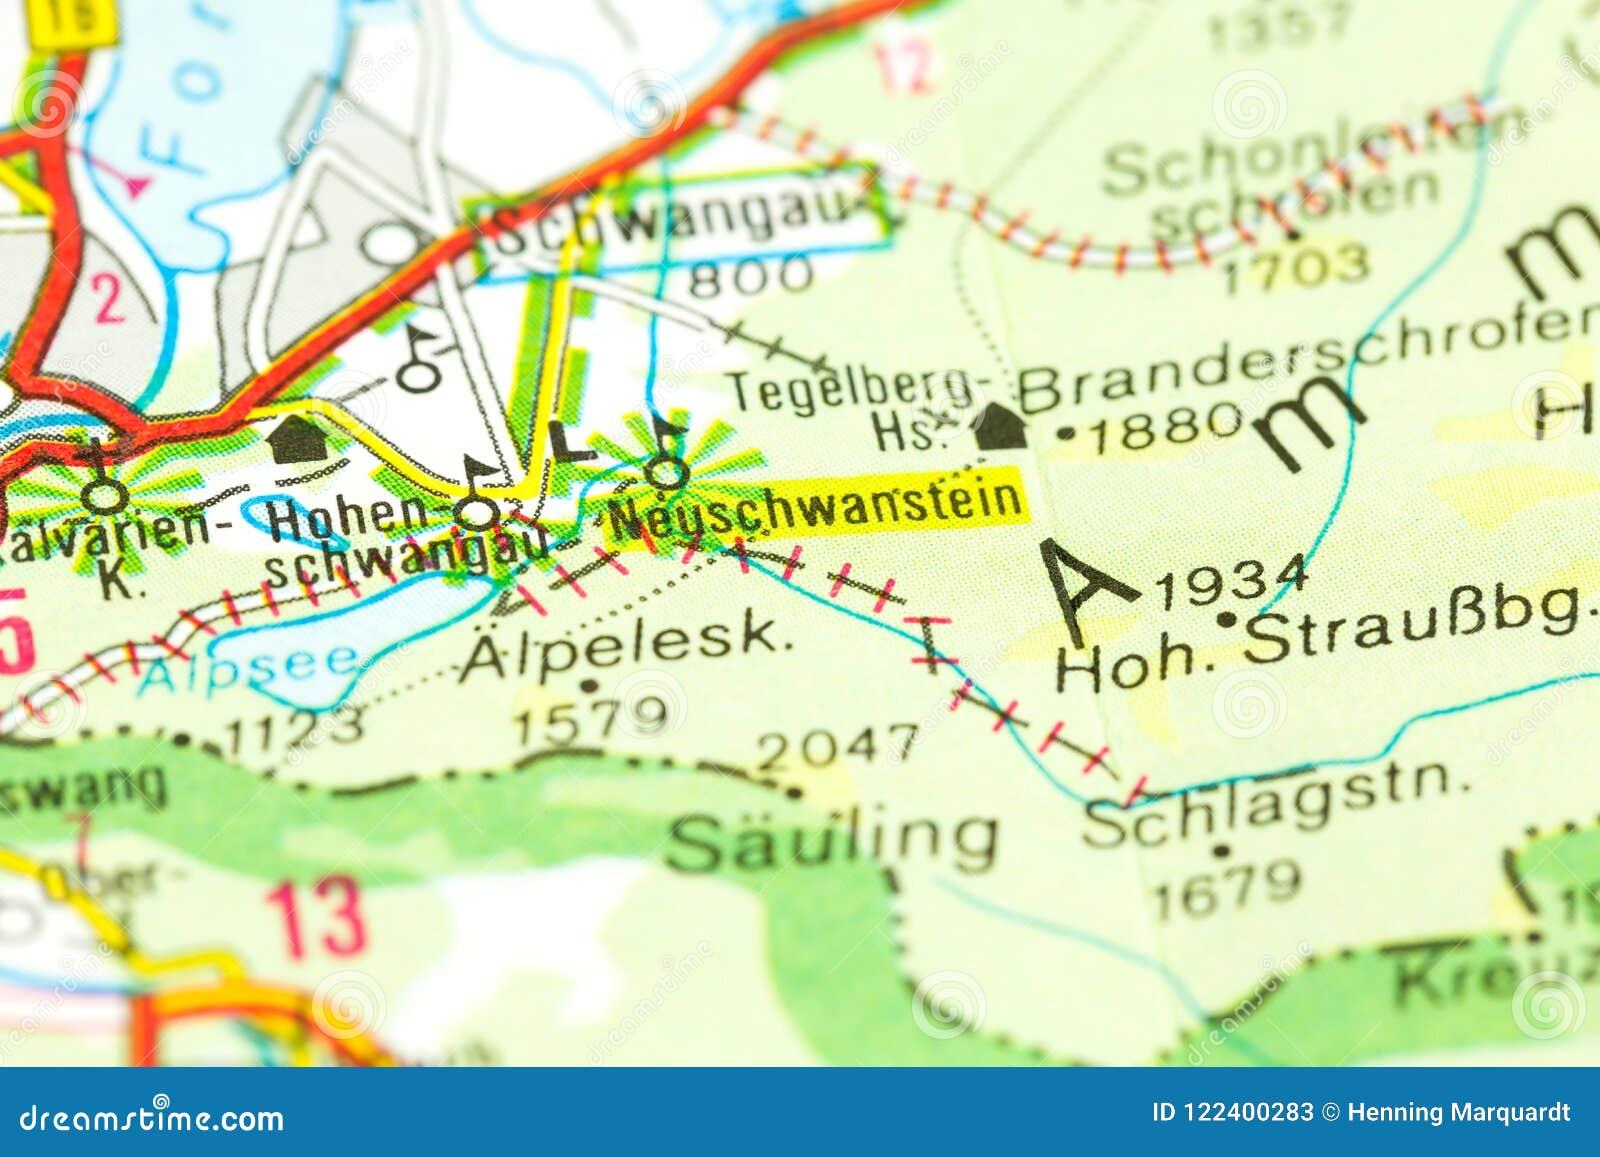 New Swanstone Castle on map, Bavaria